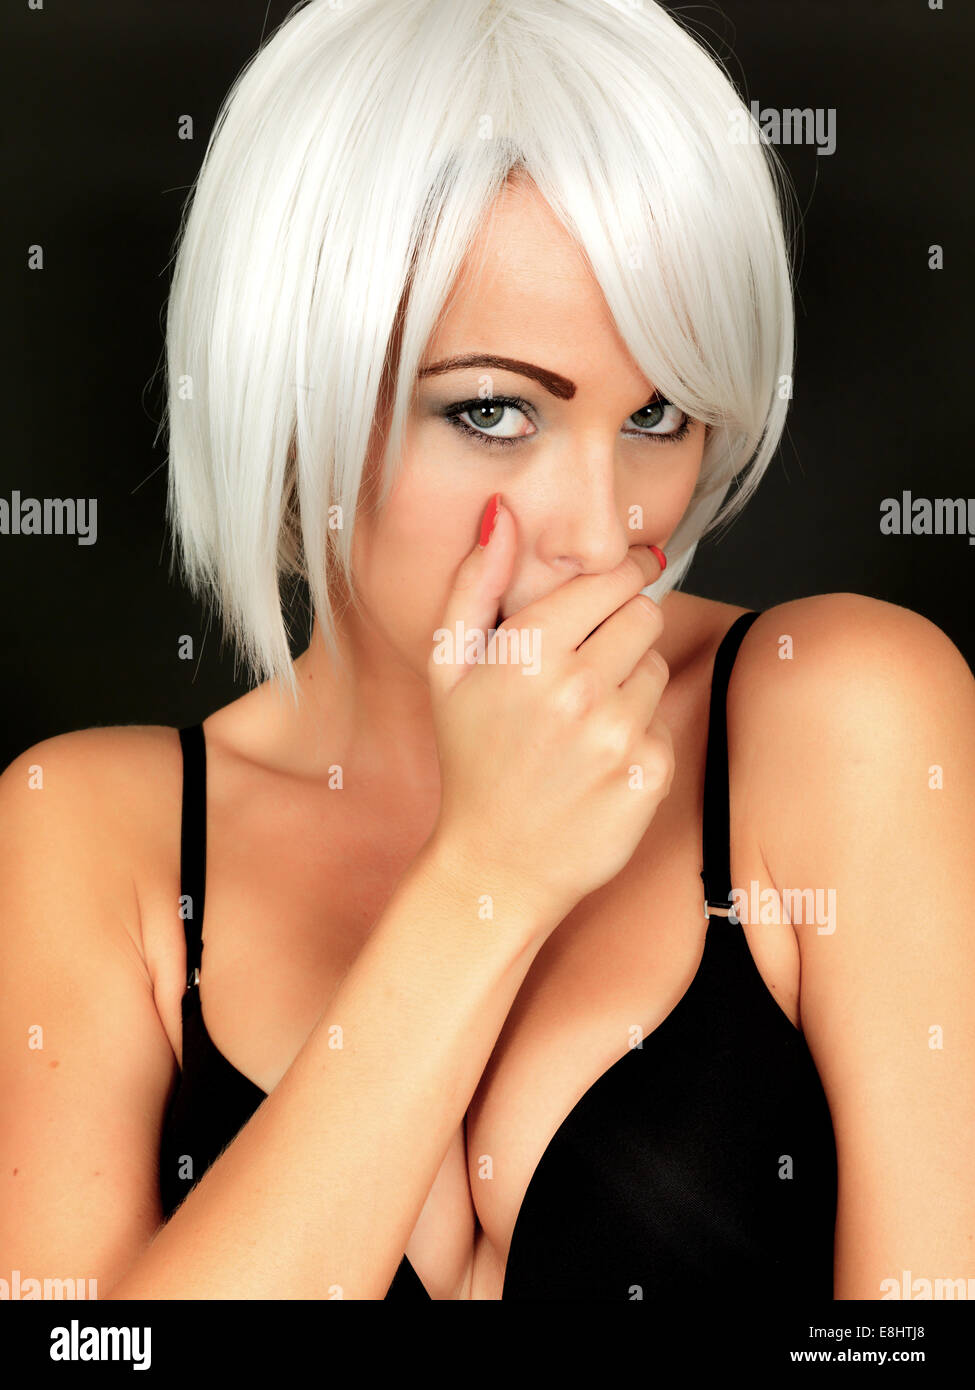 7b4a3a29b3a4b Sexy Shy Embarrassed Young Woman Wearing Black Bra Stock Photo ...